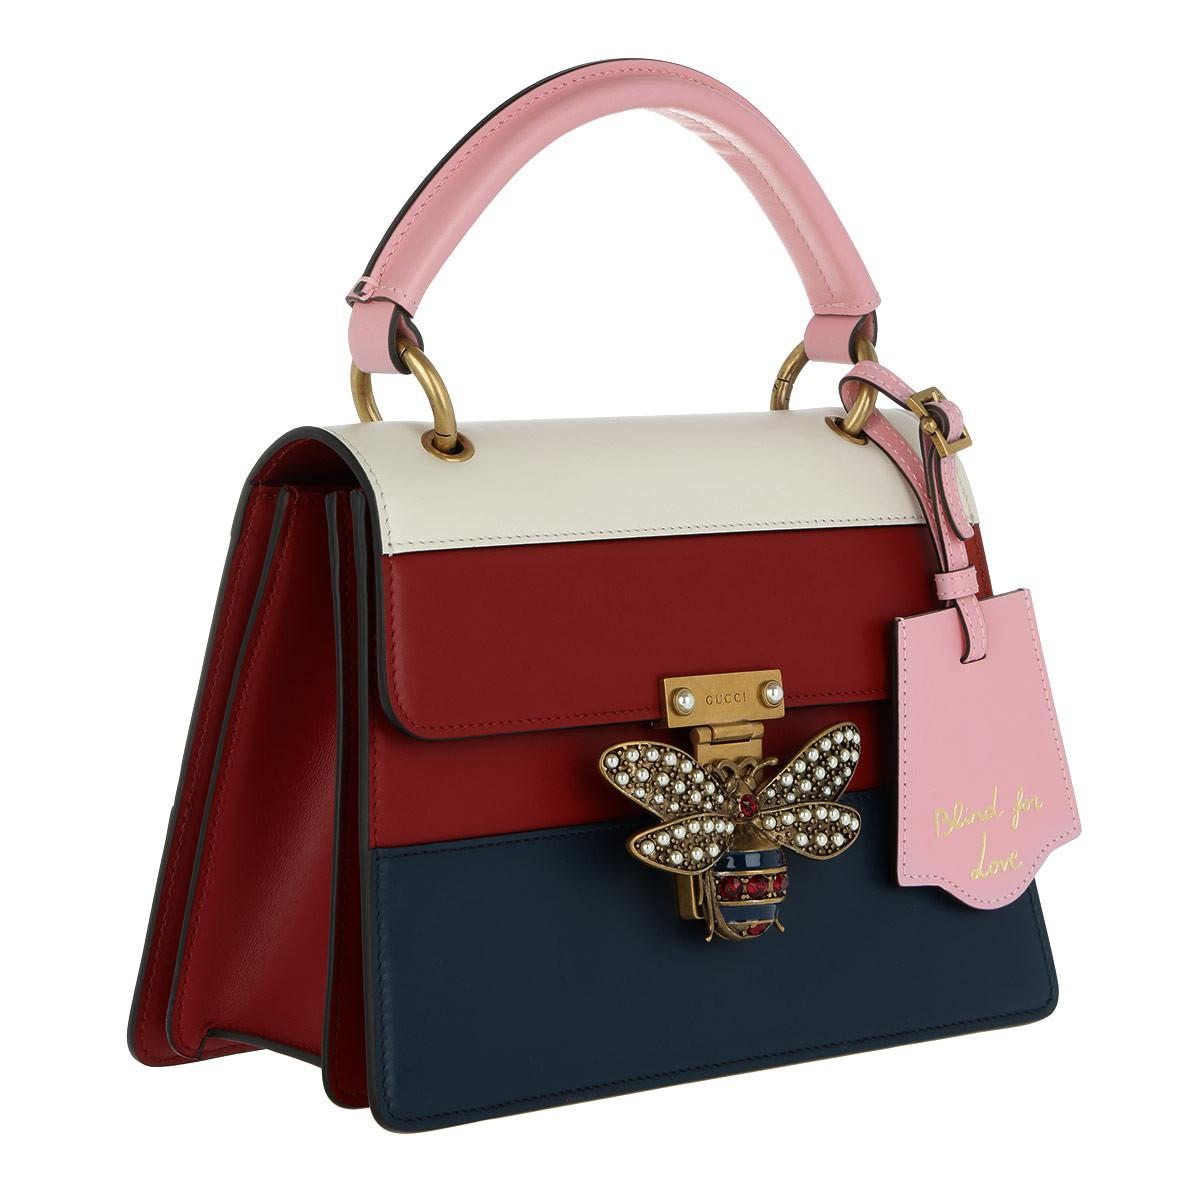 16c8cd35d Gucci Queen Margaret Small Top Handle Bag Multicolor - Lyst